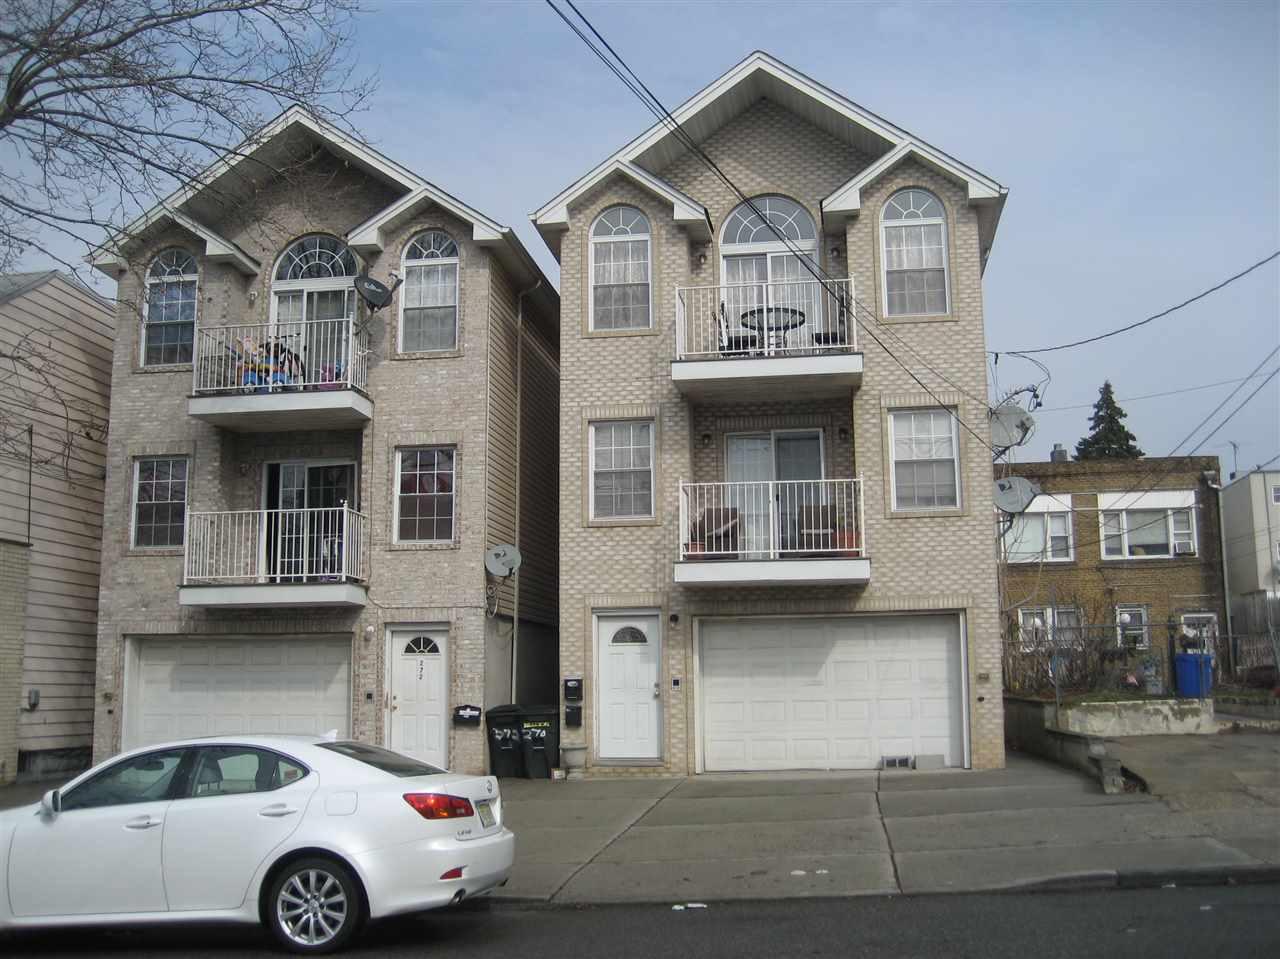 270 DANFORTH AVE, JC, West Bergen, NJ 07305